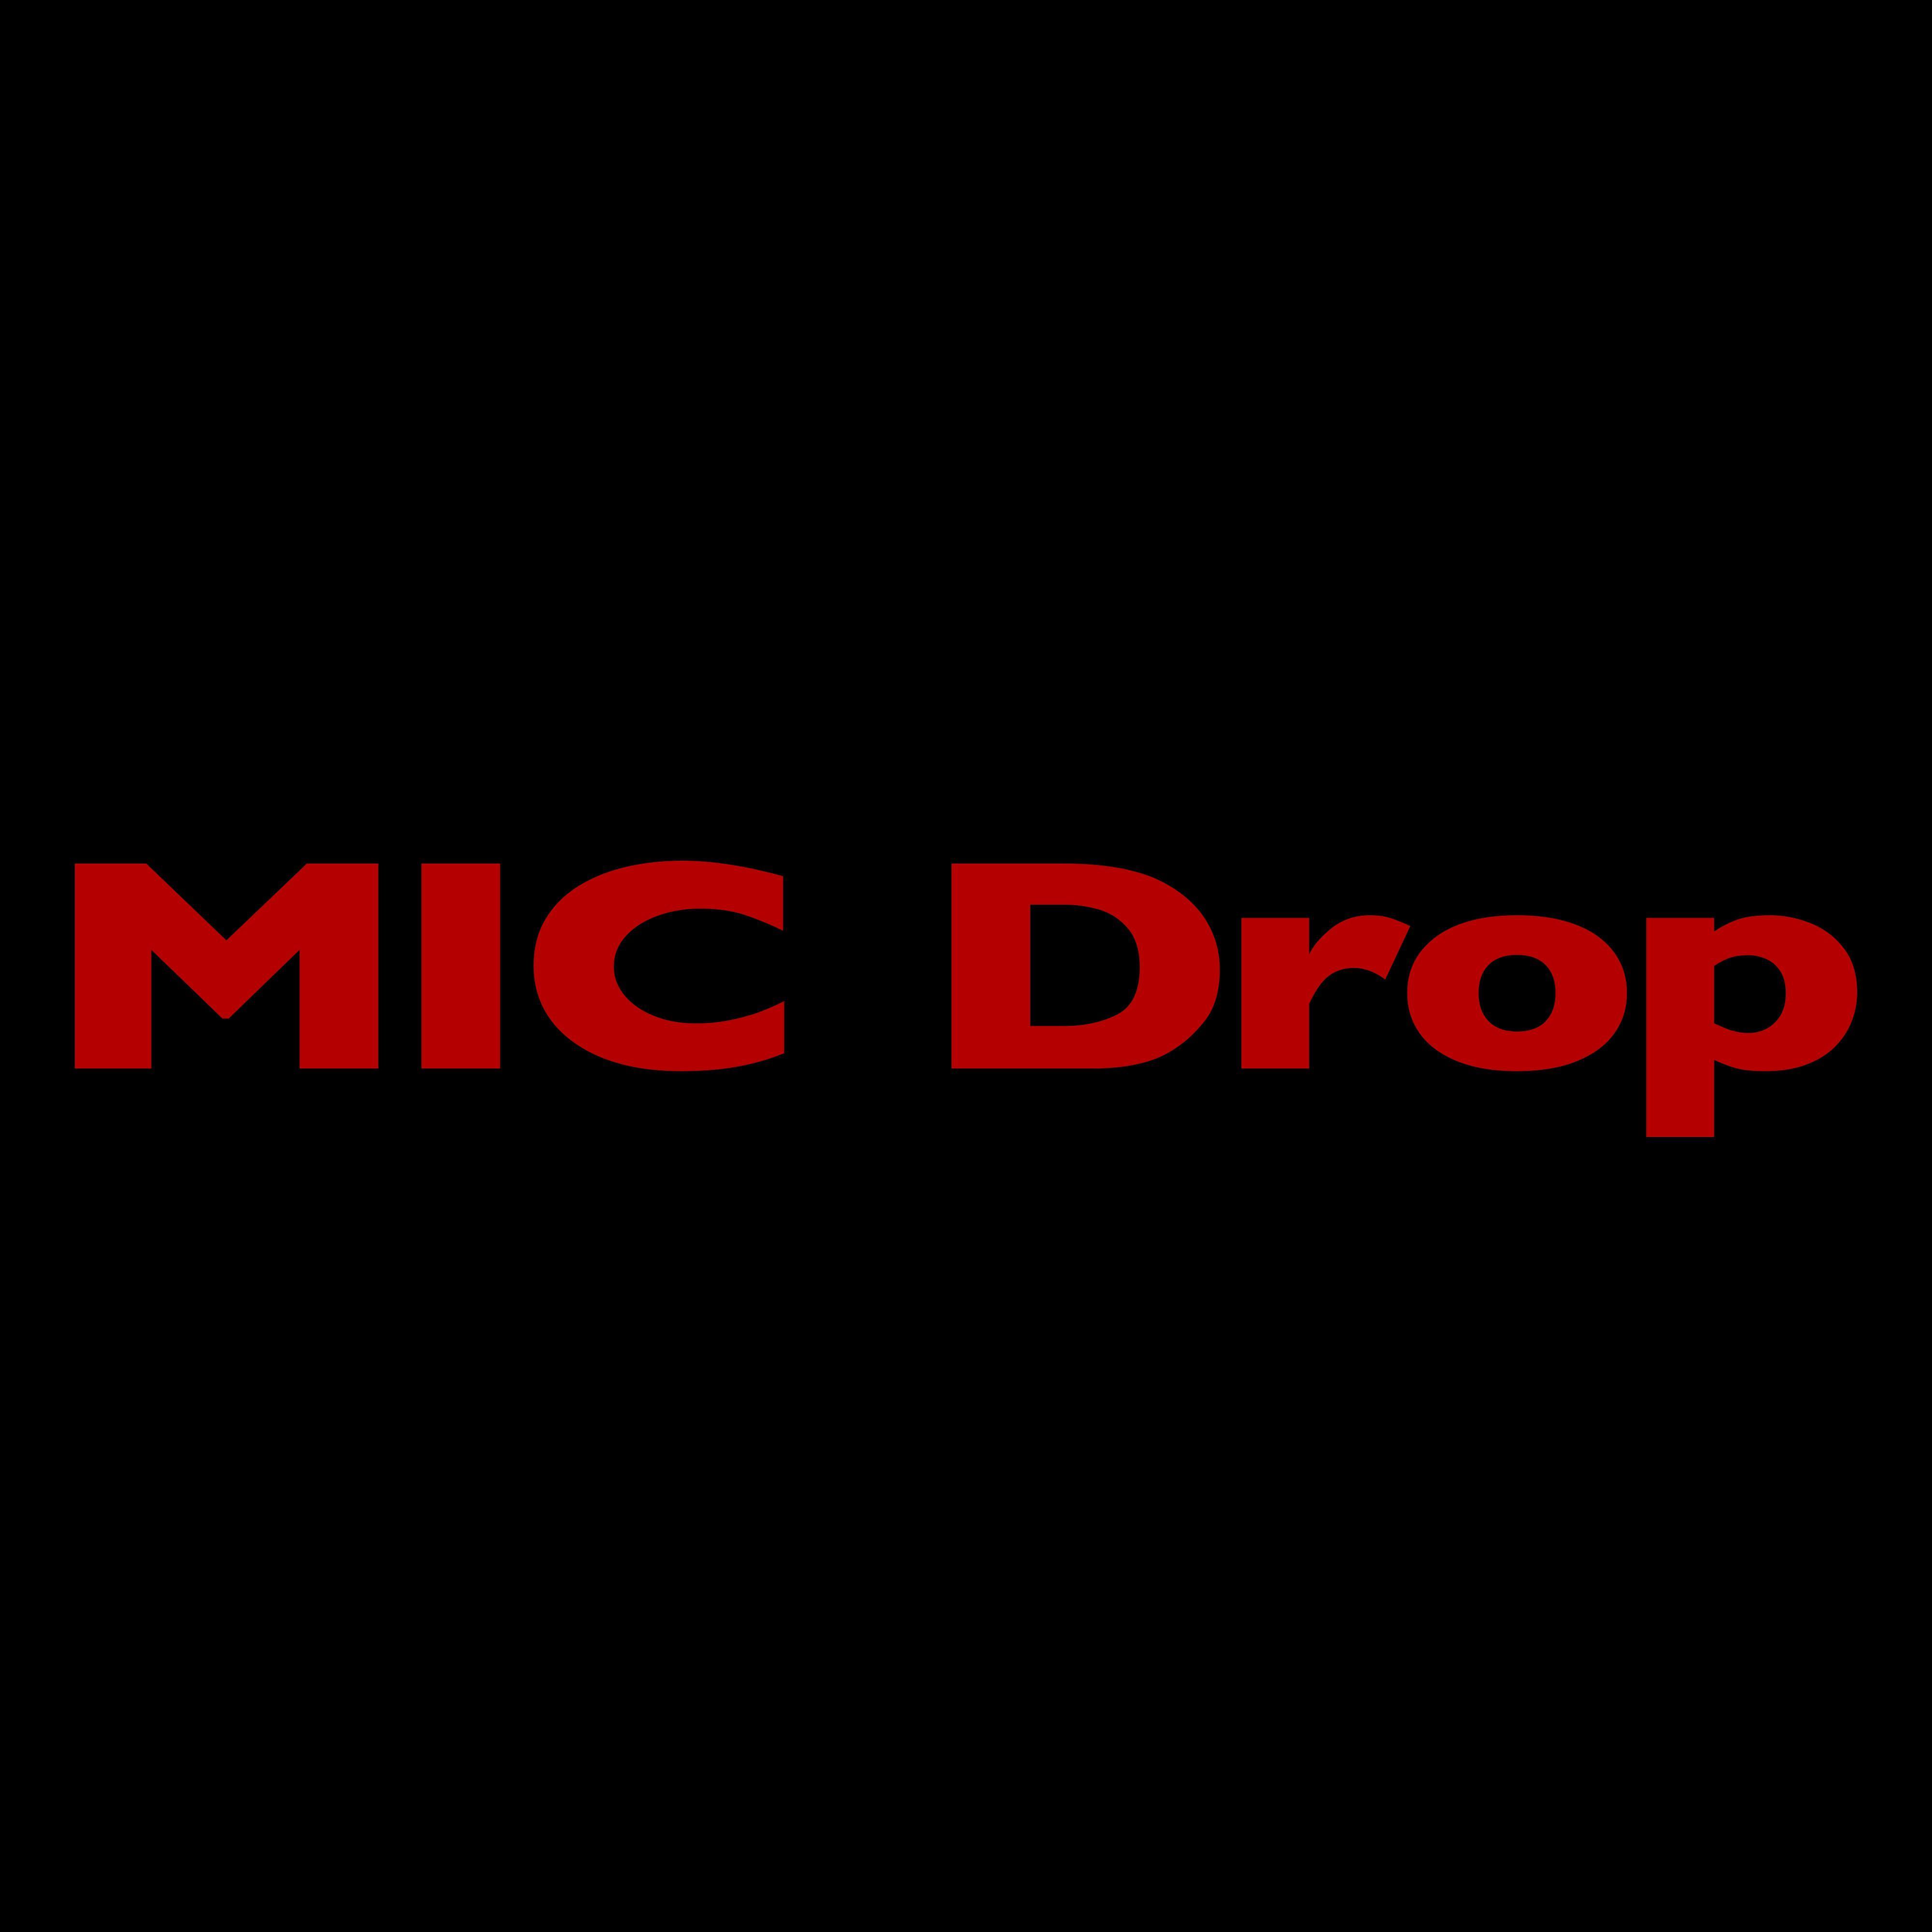 MIC Drop (Steve Aoki Remix) Feat. Desiigner